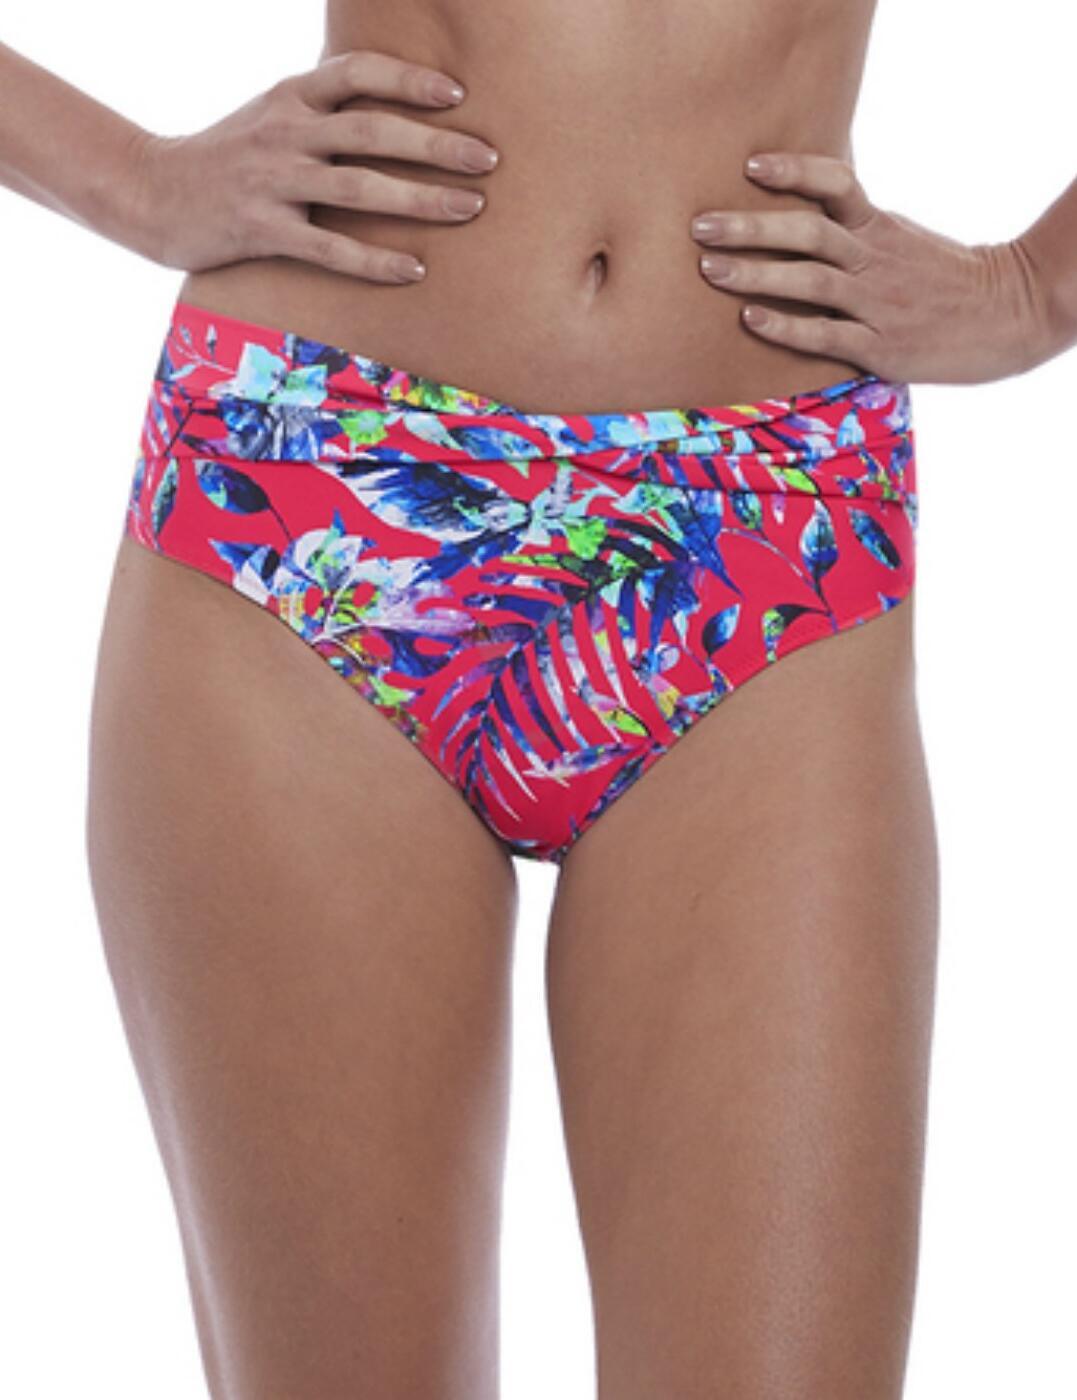 6543 Fantasie Fiji Classic Twist Bikini Brief  - 6543 Azalea